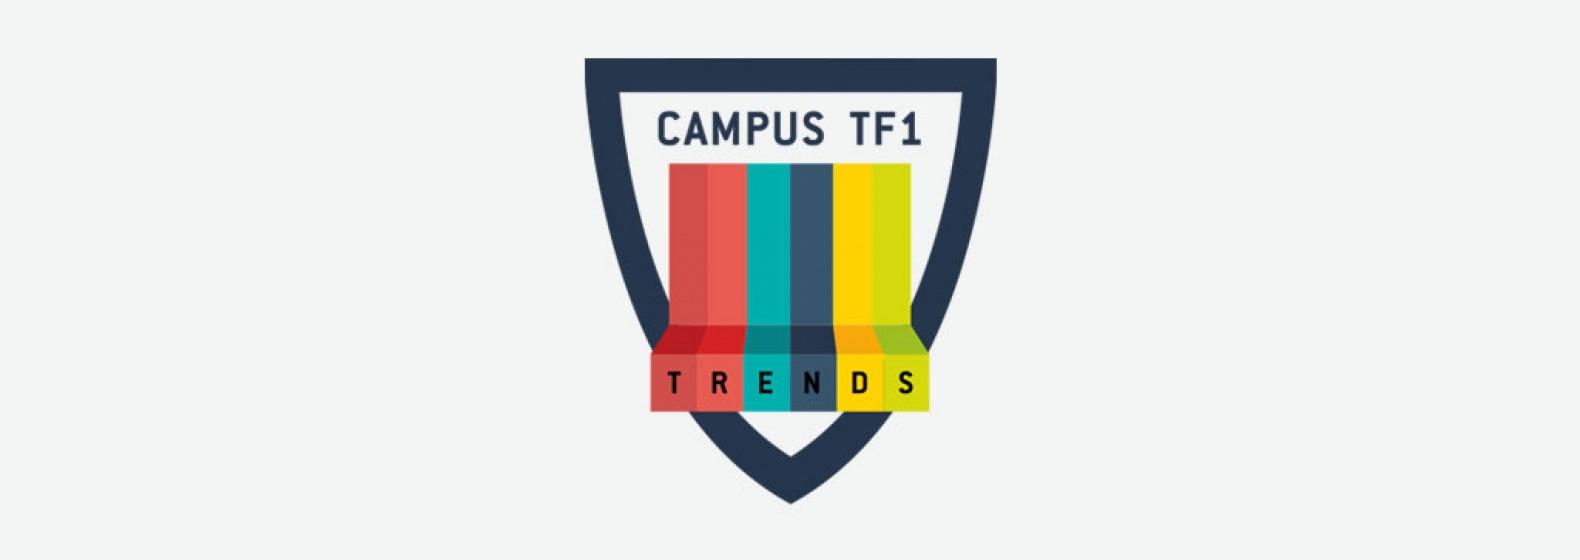 Campus TF1 Trends 2017